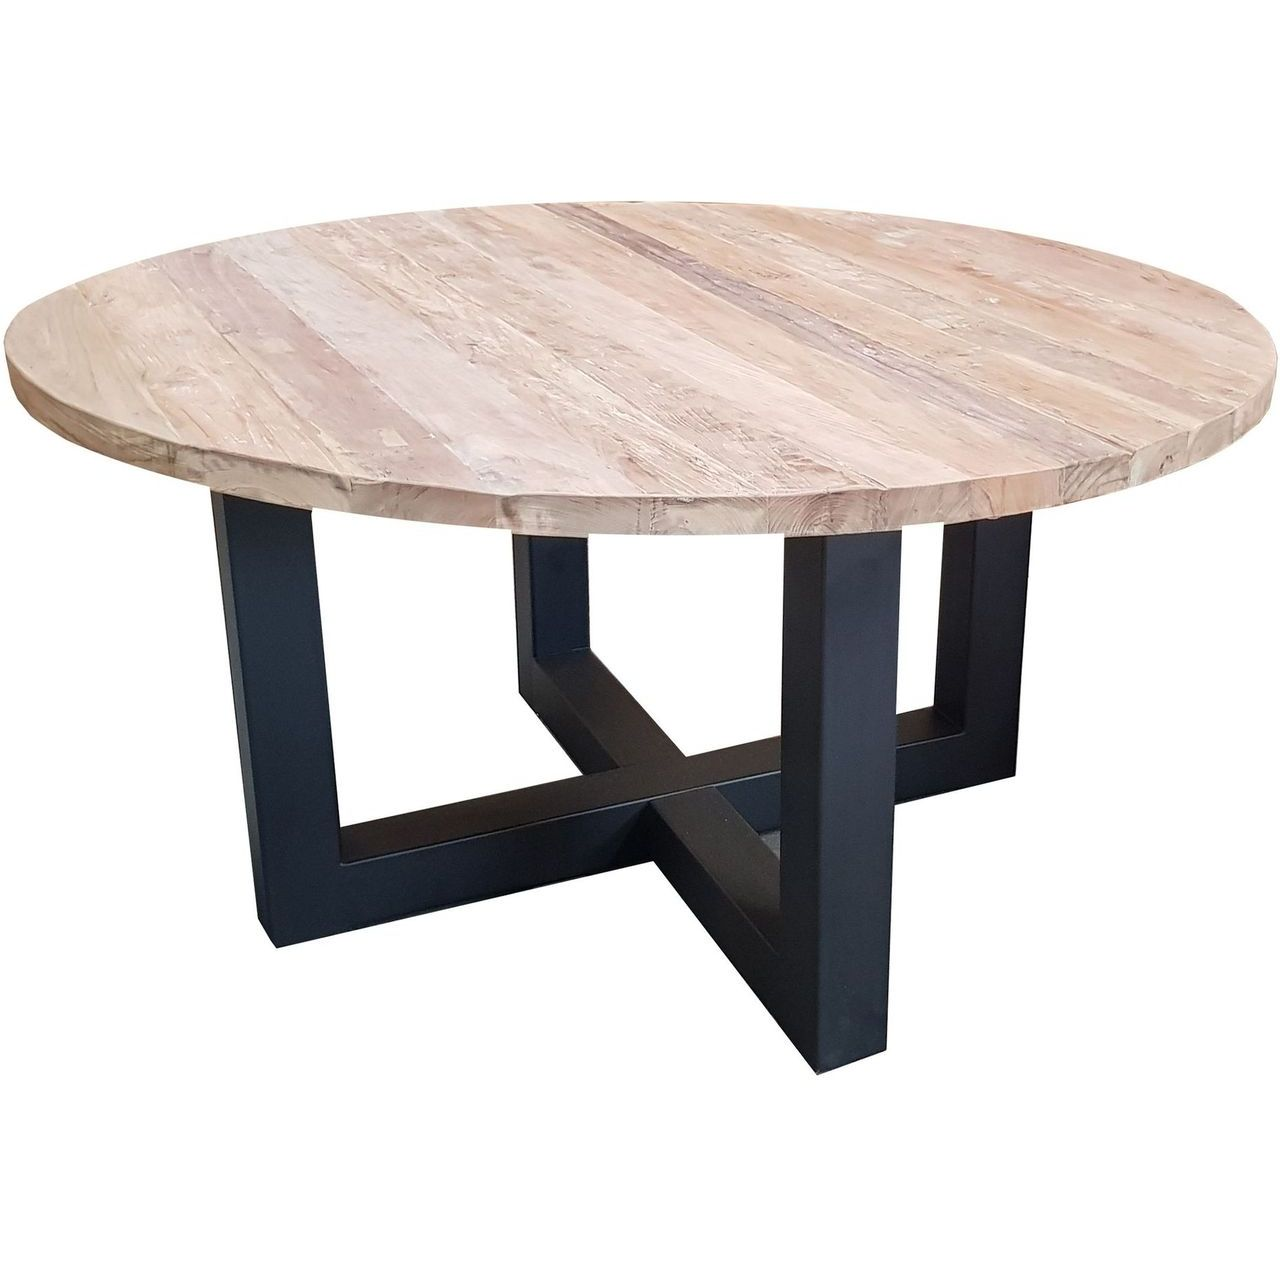 "Padma Giorgia 59"" Reclaimed Teak Dining Table"